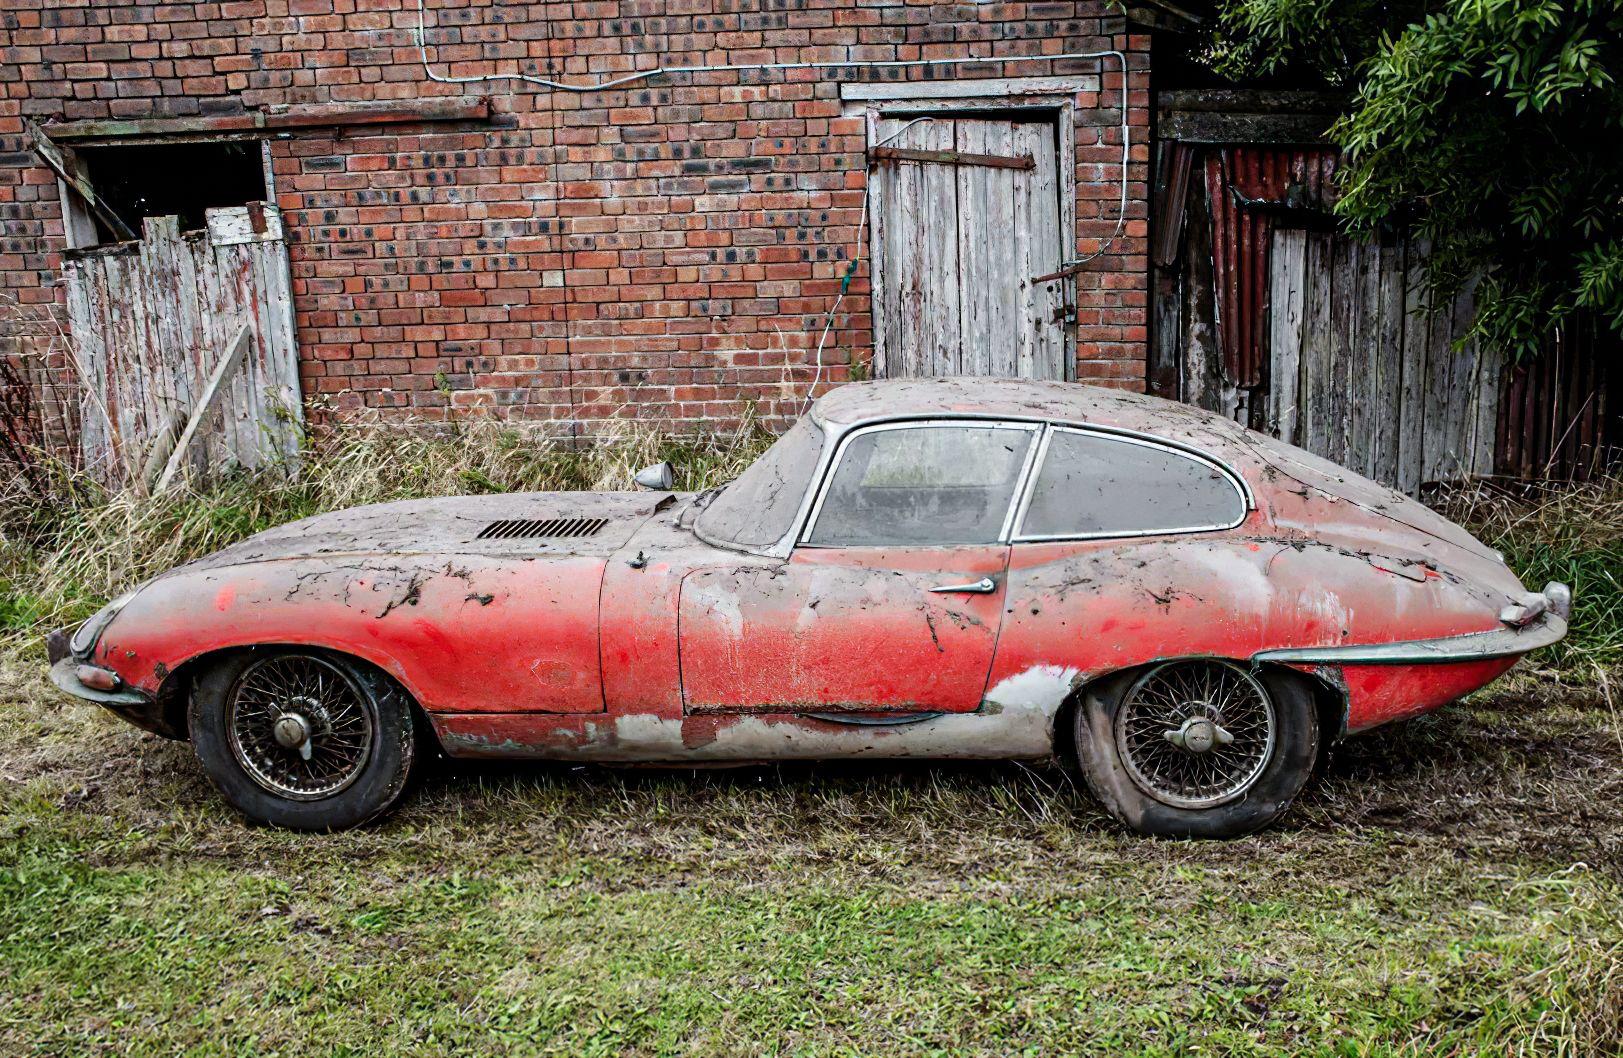 Abandoned 1964 Jaguar E-Type in 2020   E type, Jaguar e typ, Oldtimer jaguar